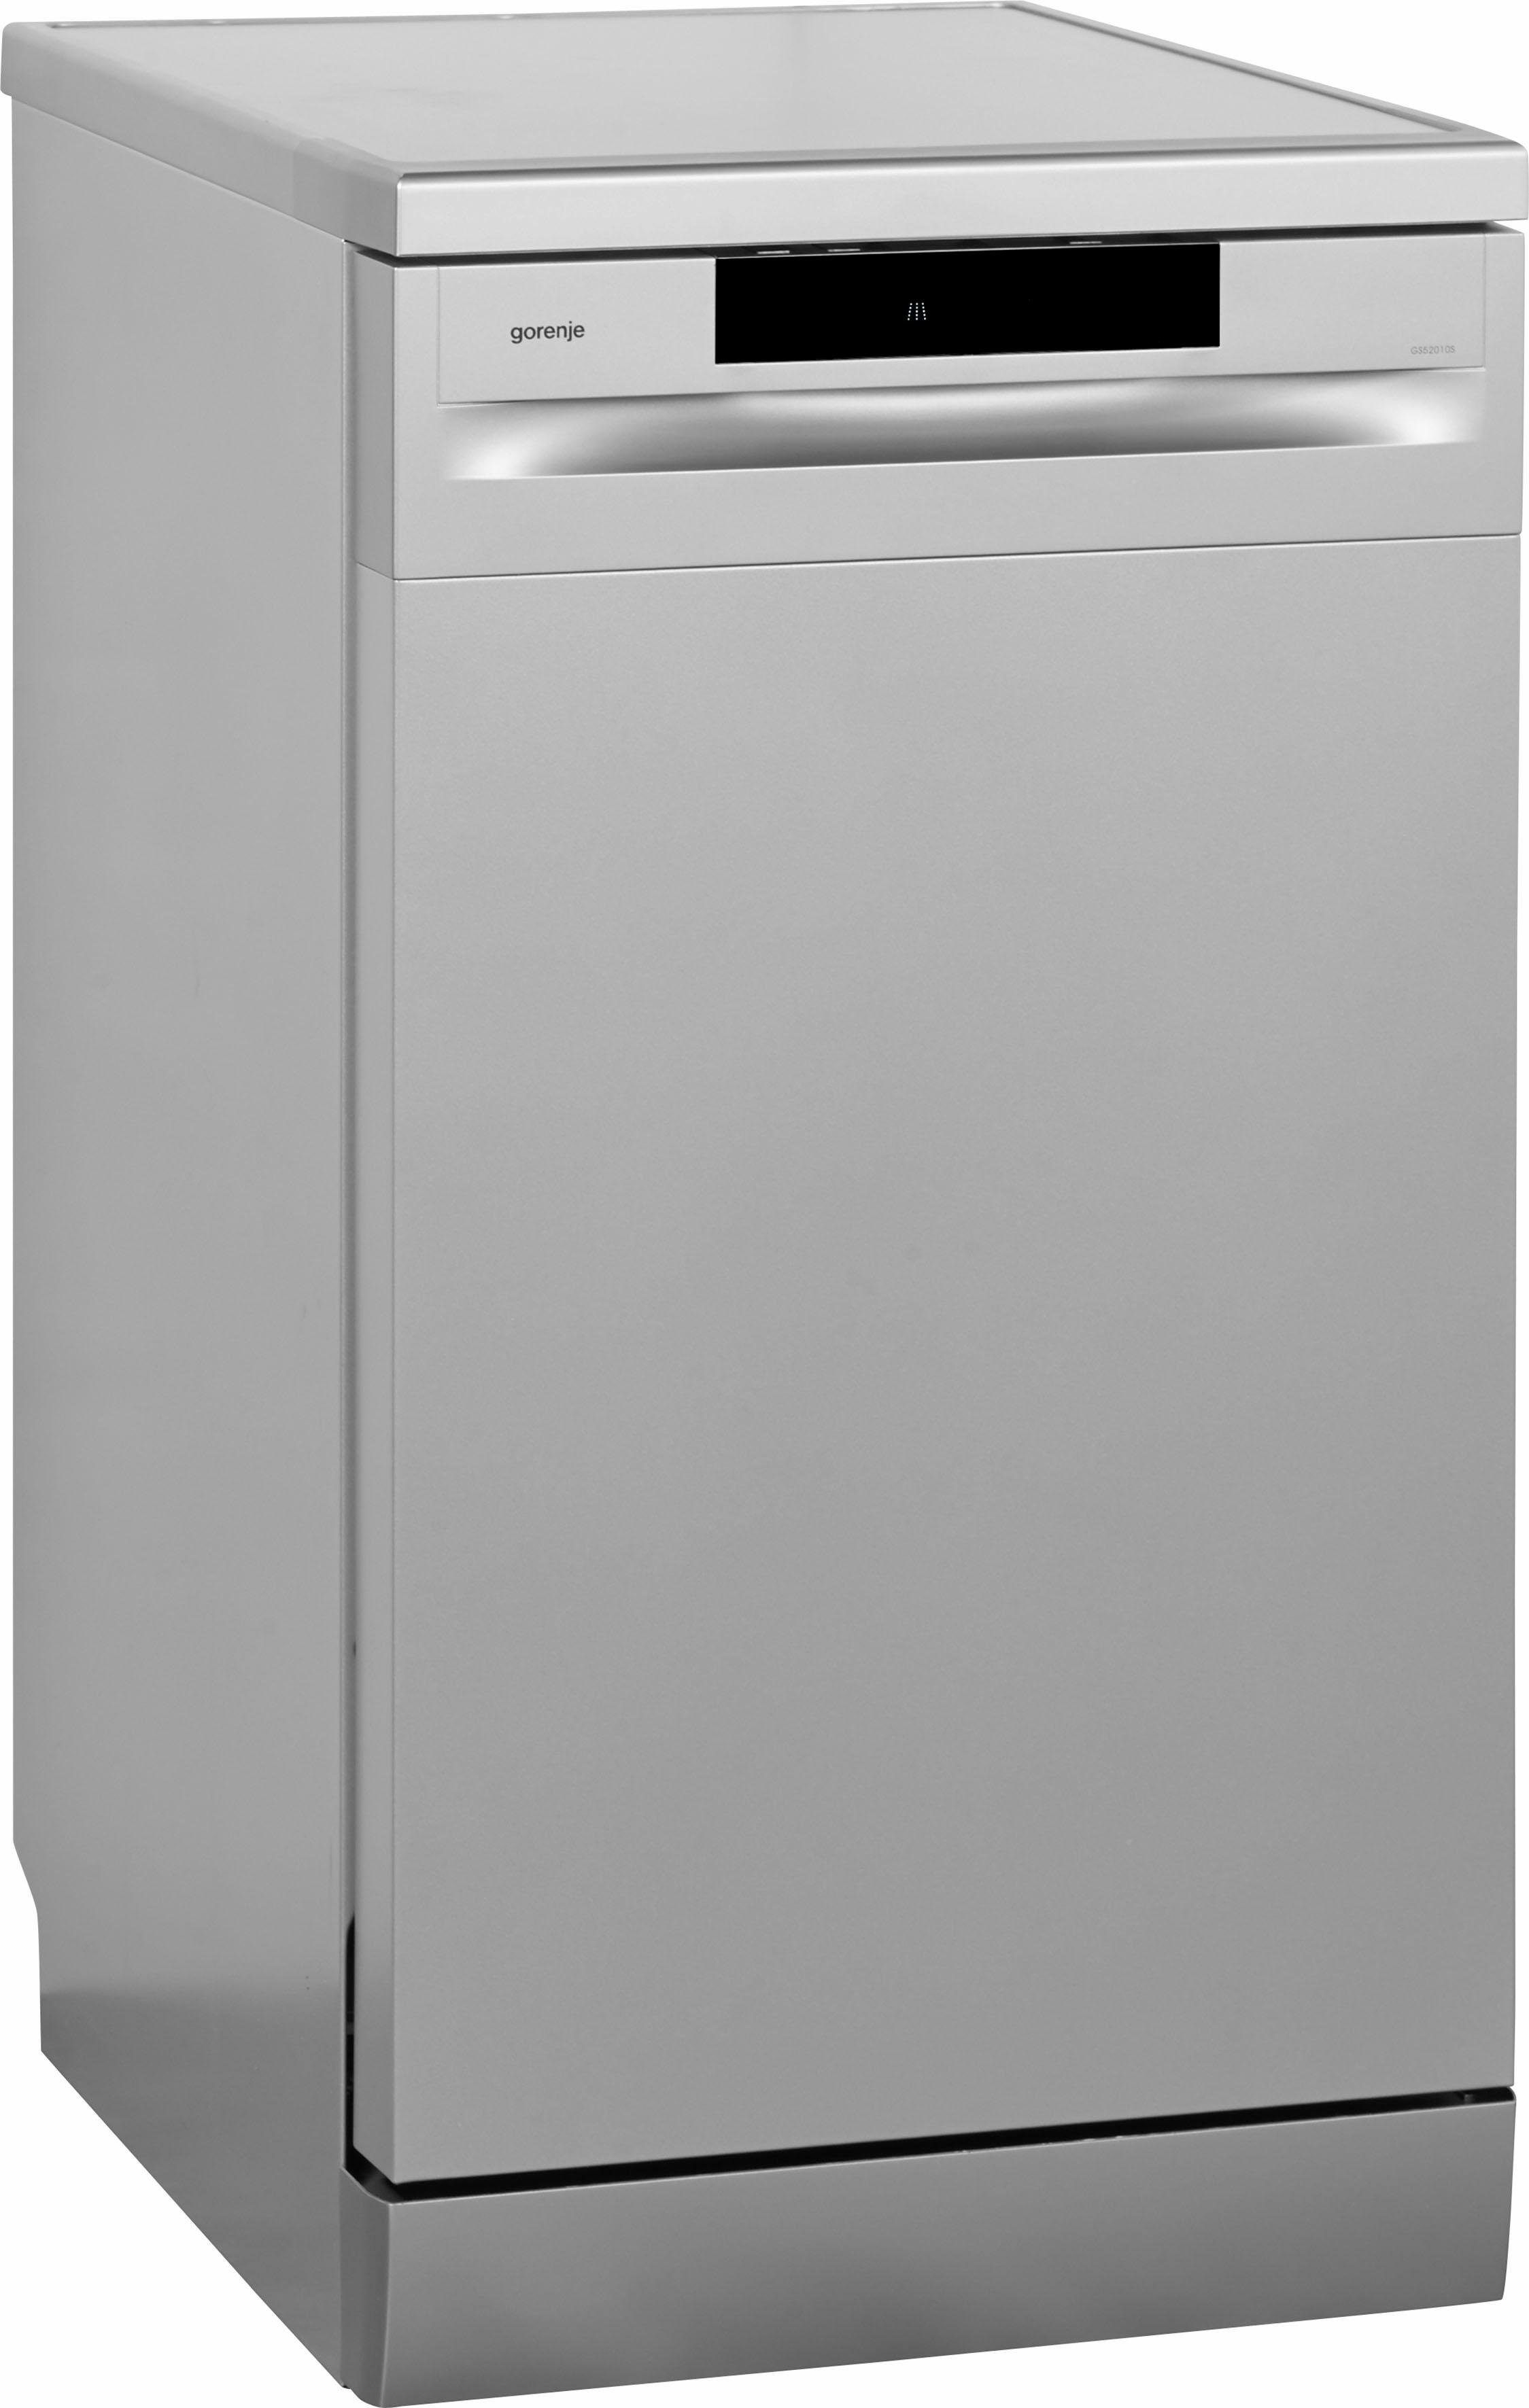 GORENJE Unterbaugeschirrspüler, GS52010S, 9 l, 9 Maßgedecke, Energieeffizienzklasse A++